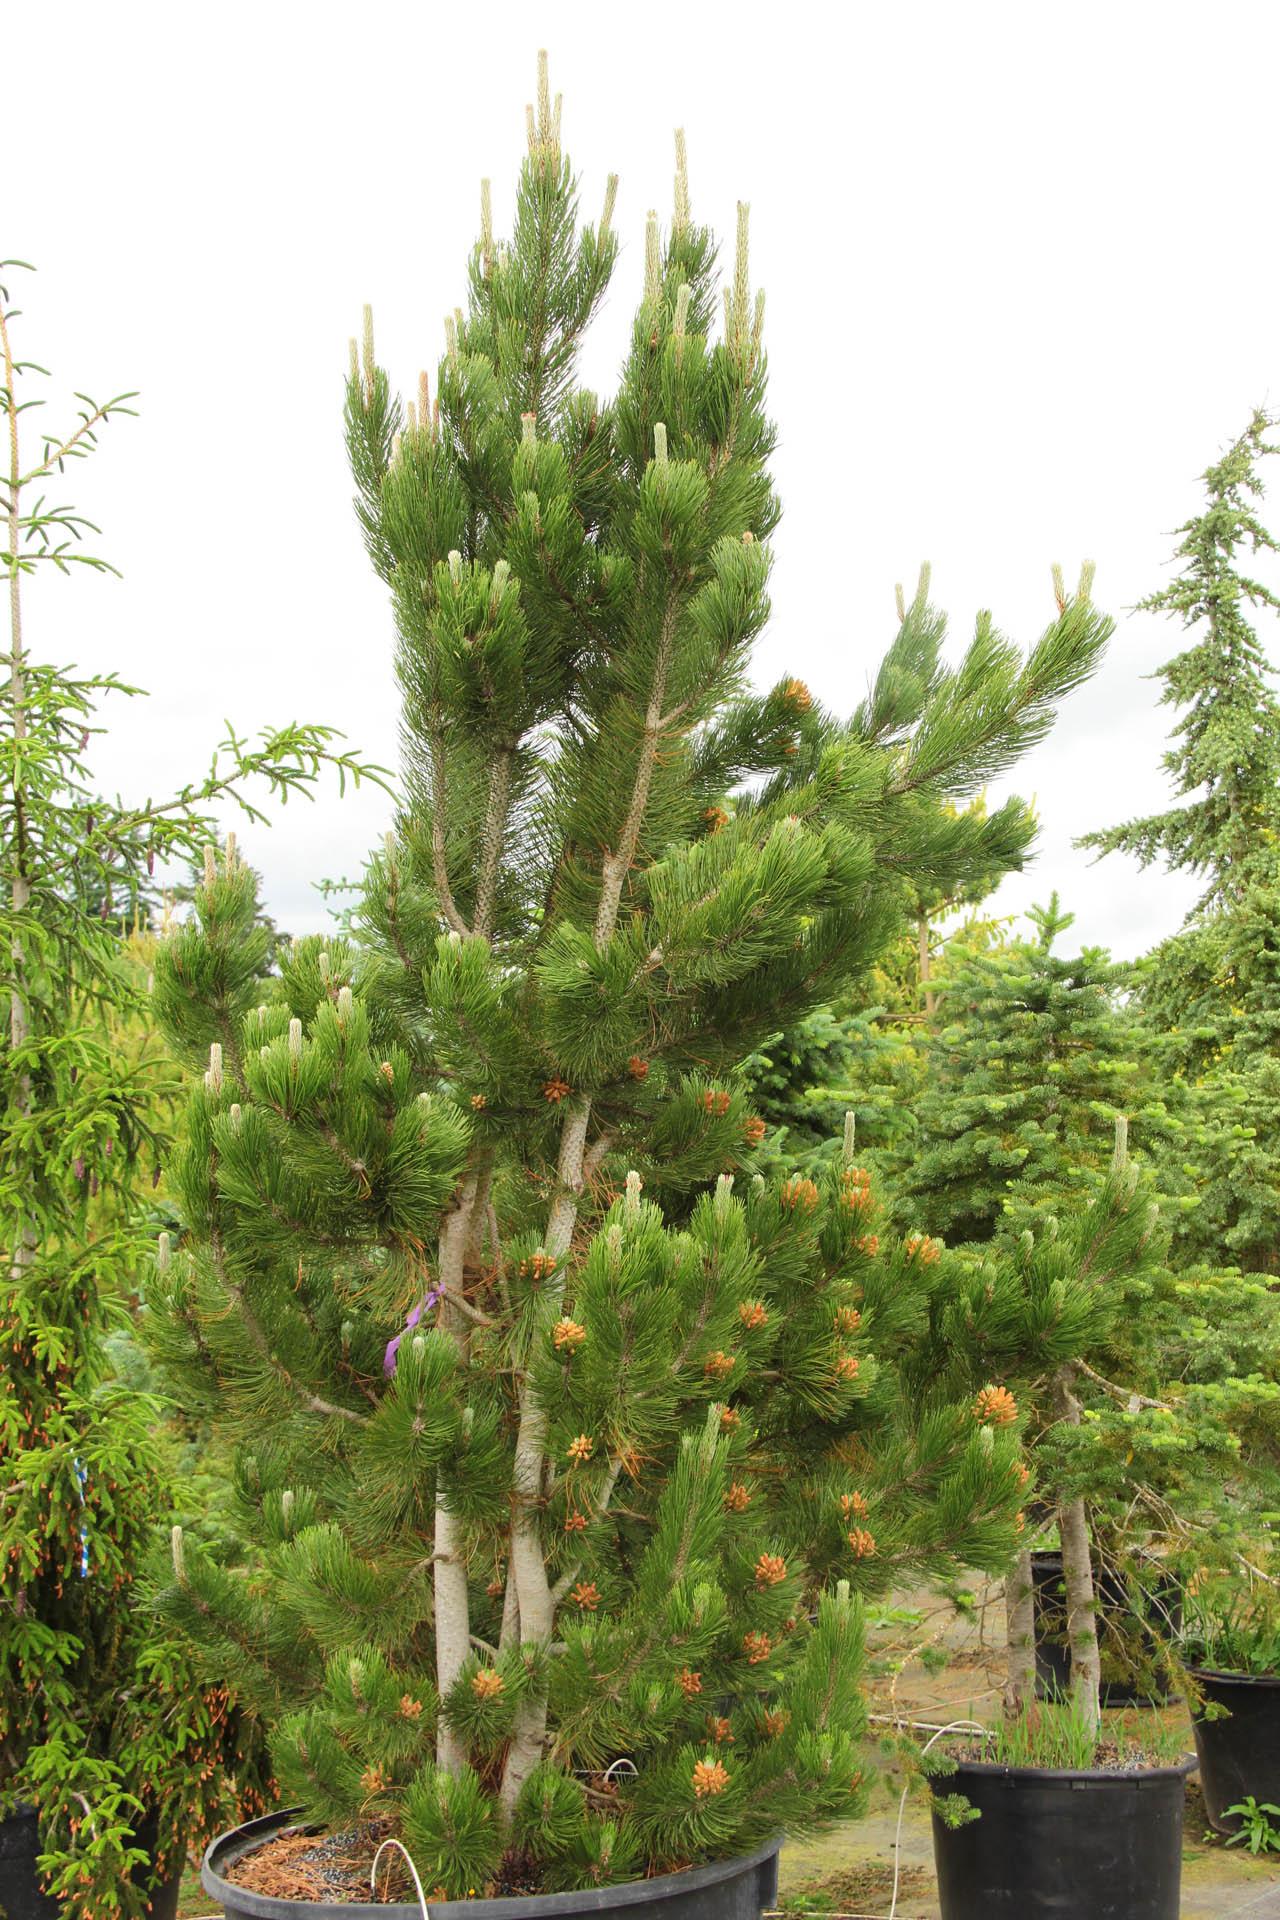 Pinus heldreichii (leucodermis) 'Satellit'